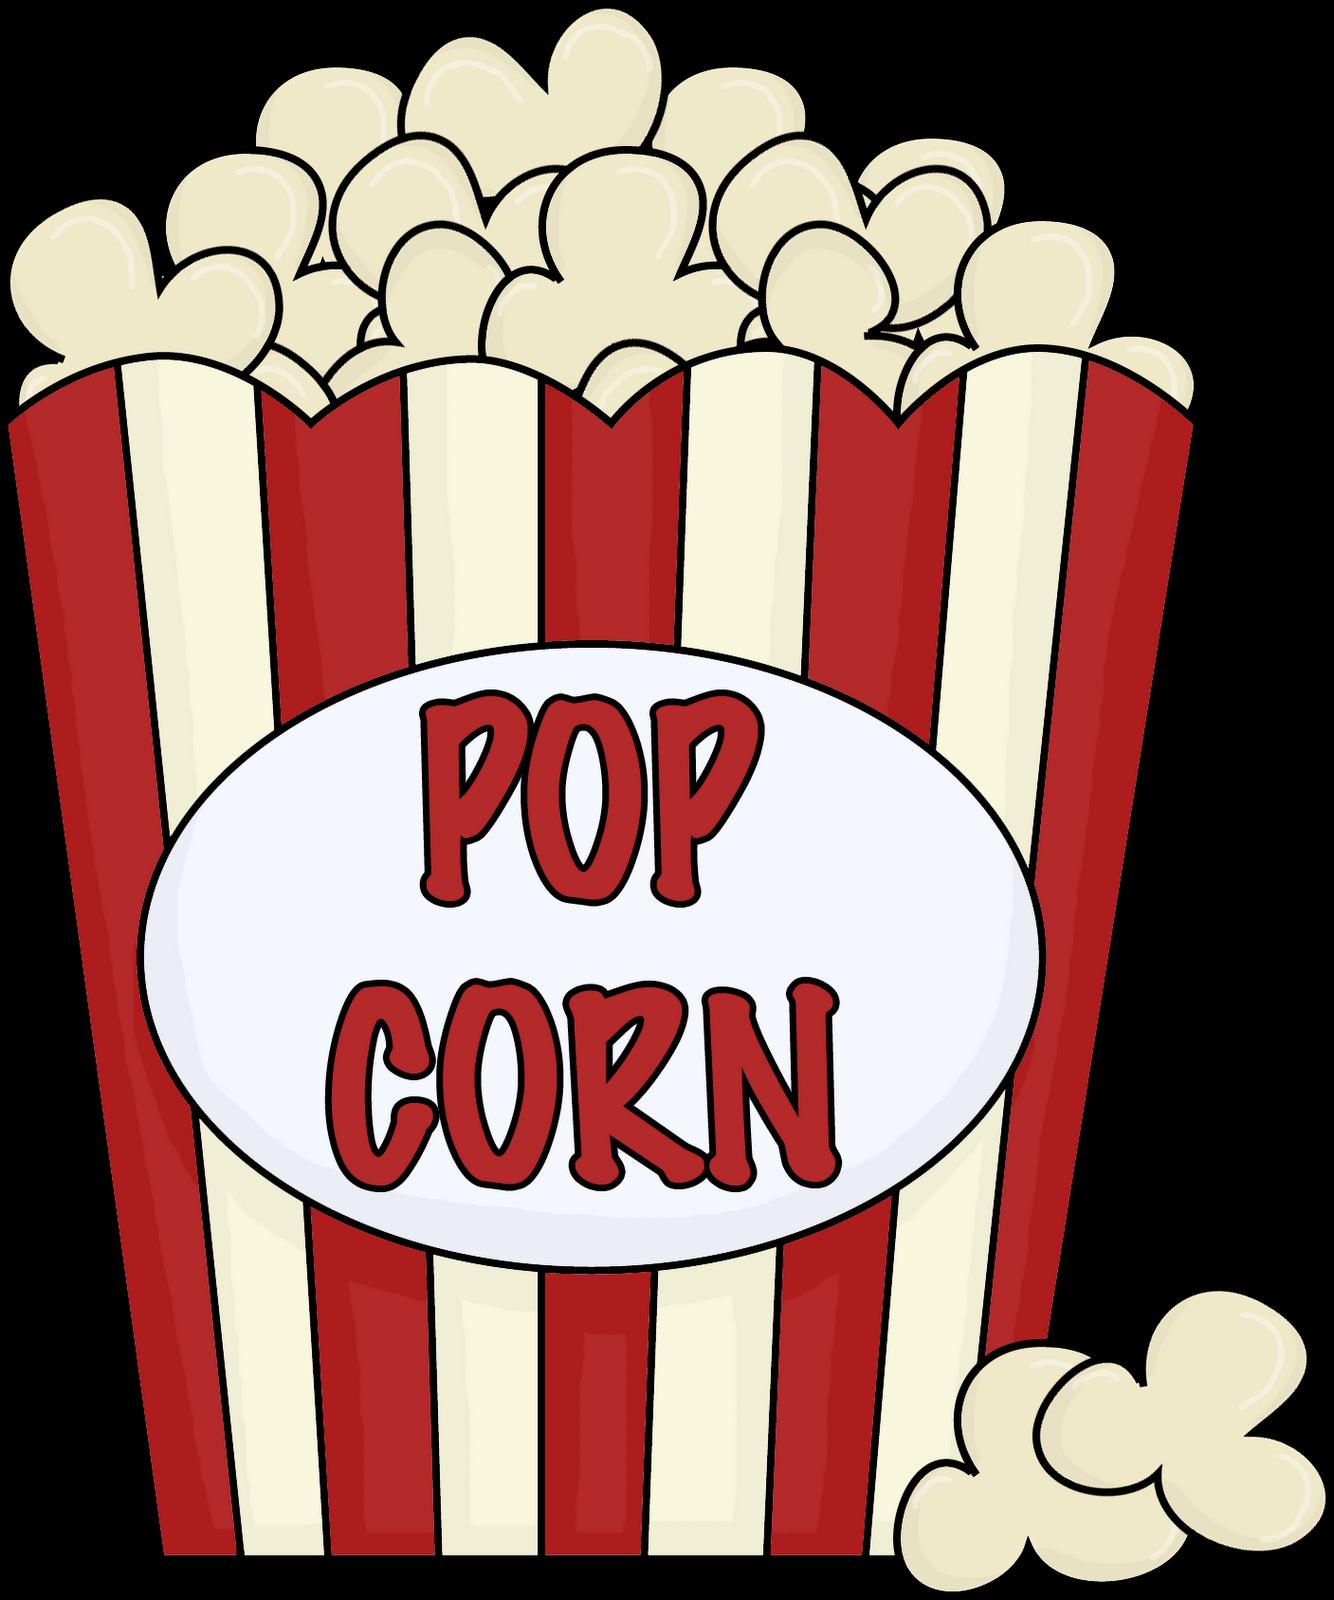 Popcorn container clipart clip black and white Free Popcorn Container Cliparts, Download Free Clip Art ... clip black and white